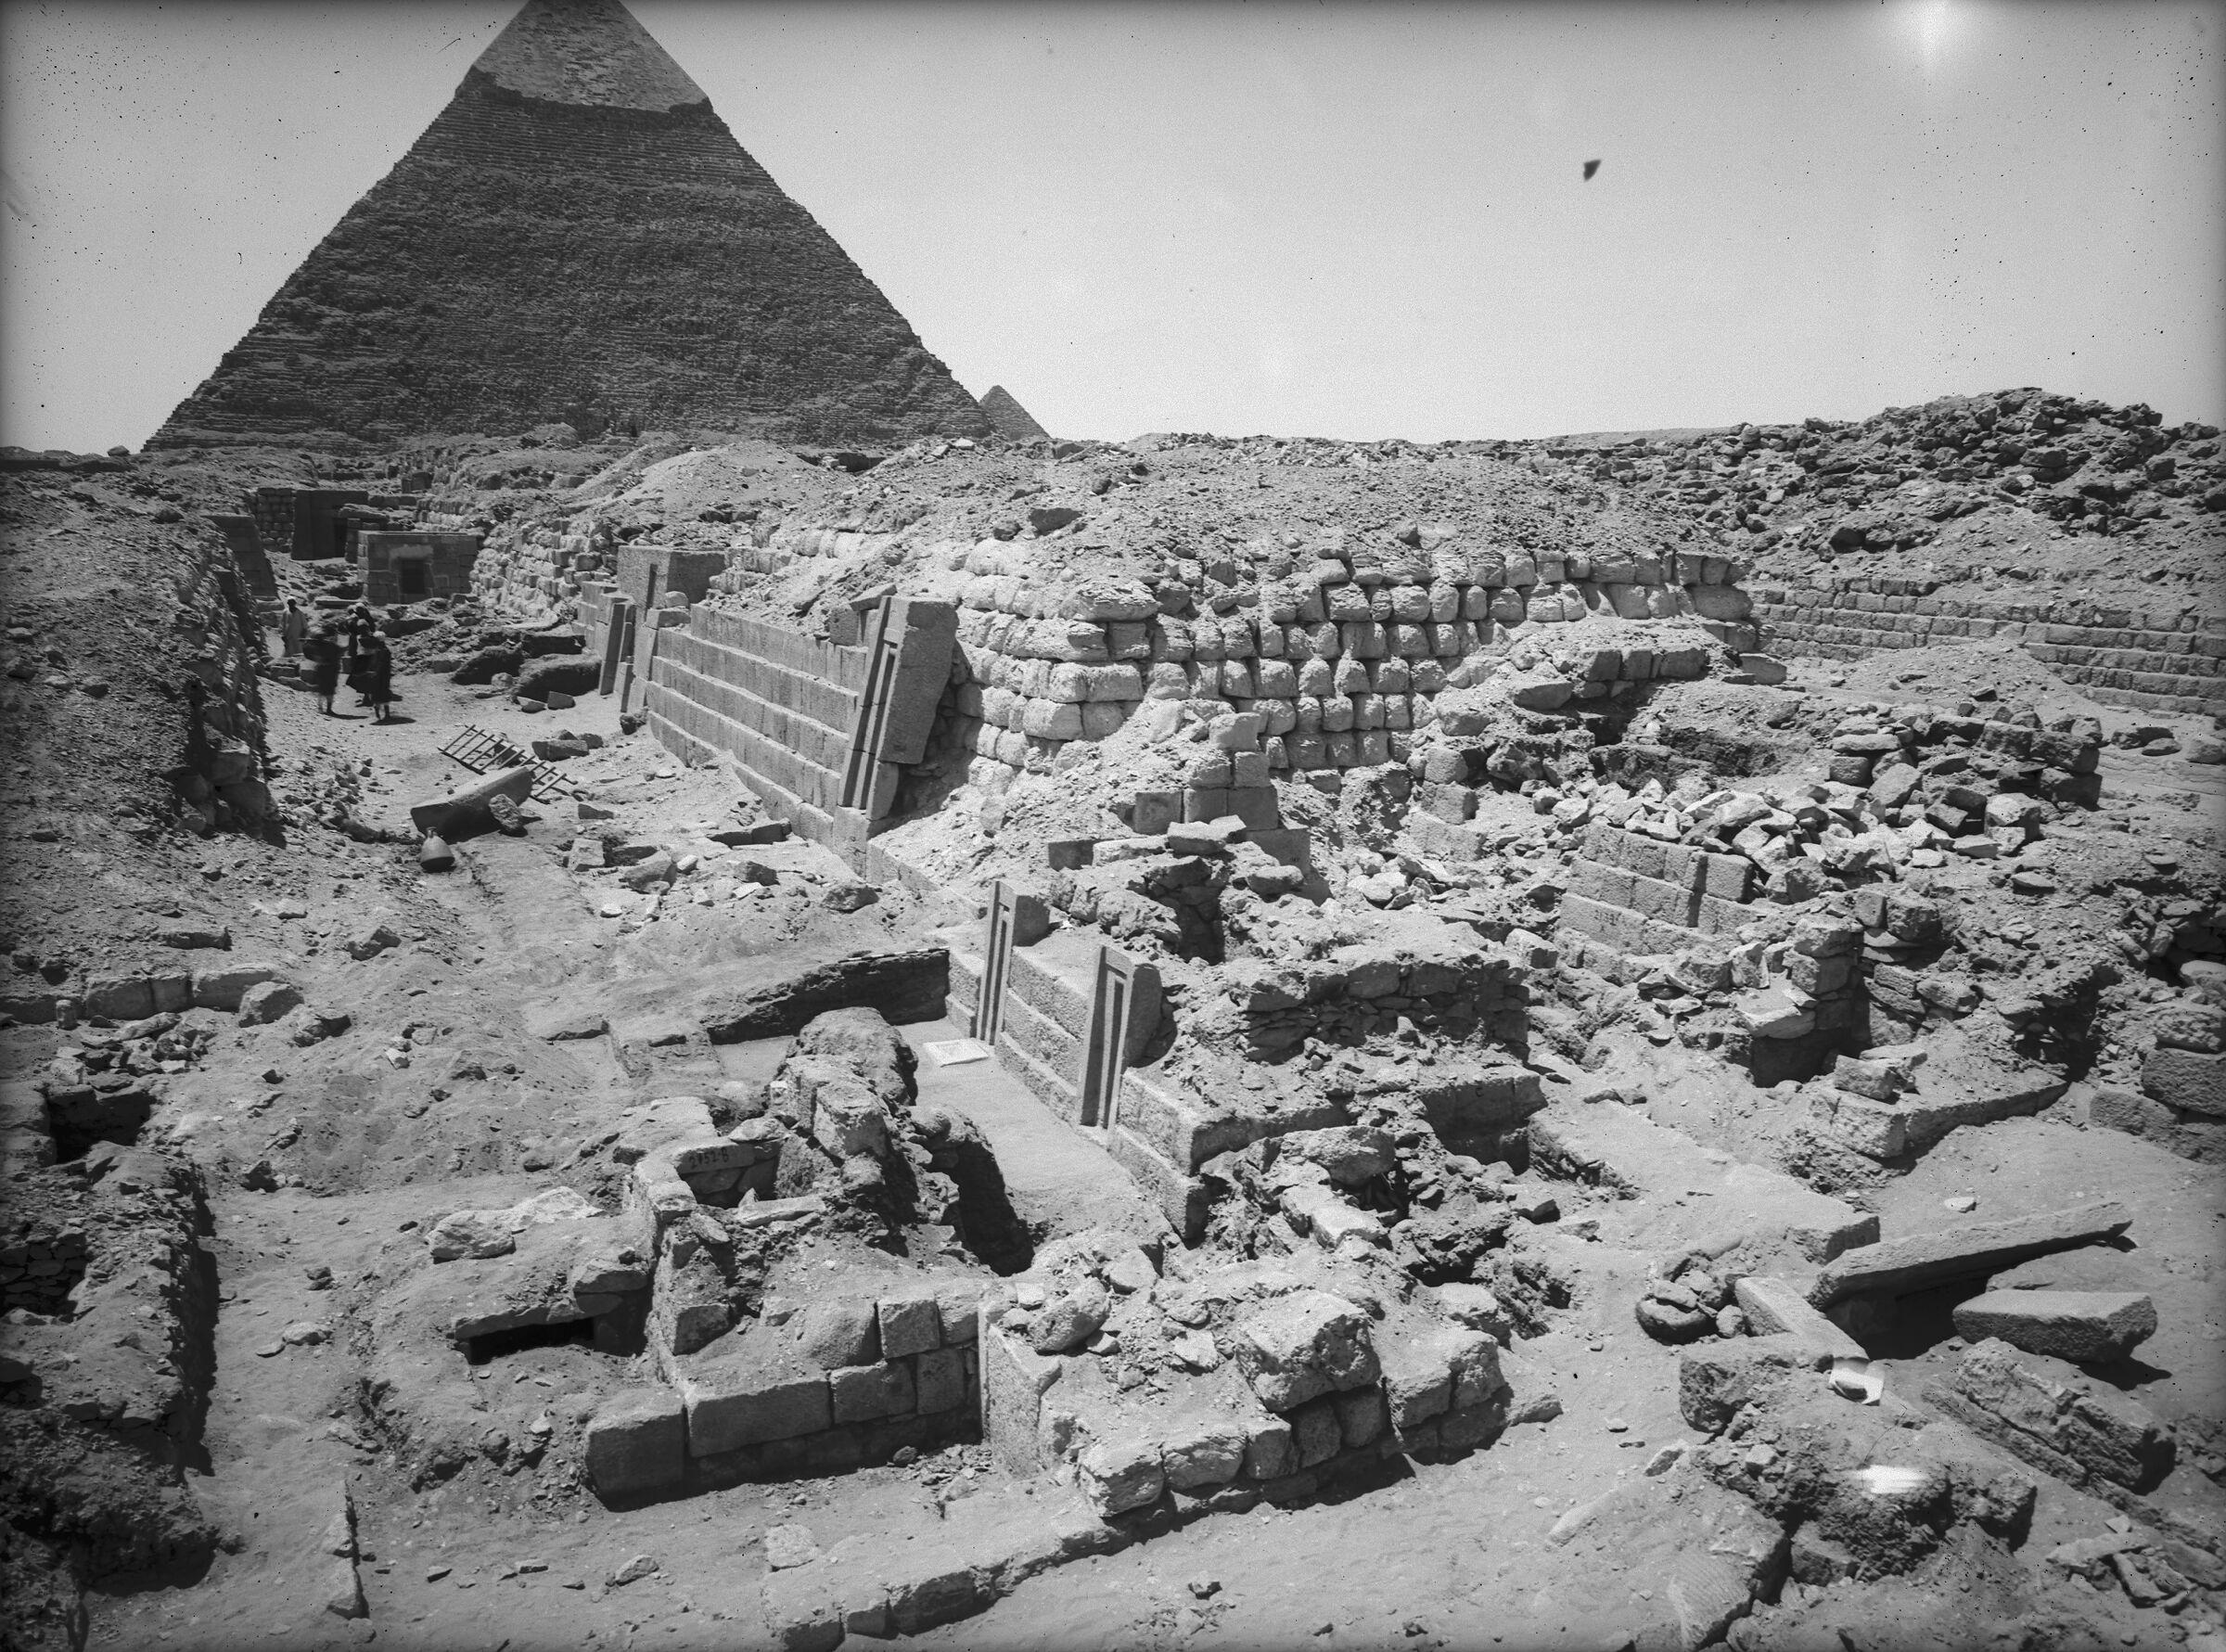 Western Cemetery: Site: Giza; View: G 2170, G 2150, G 2154, G 2153, G 2152, G 2151, G 2136', G 2134a, G 2132, G 2138